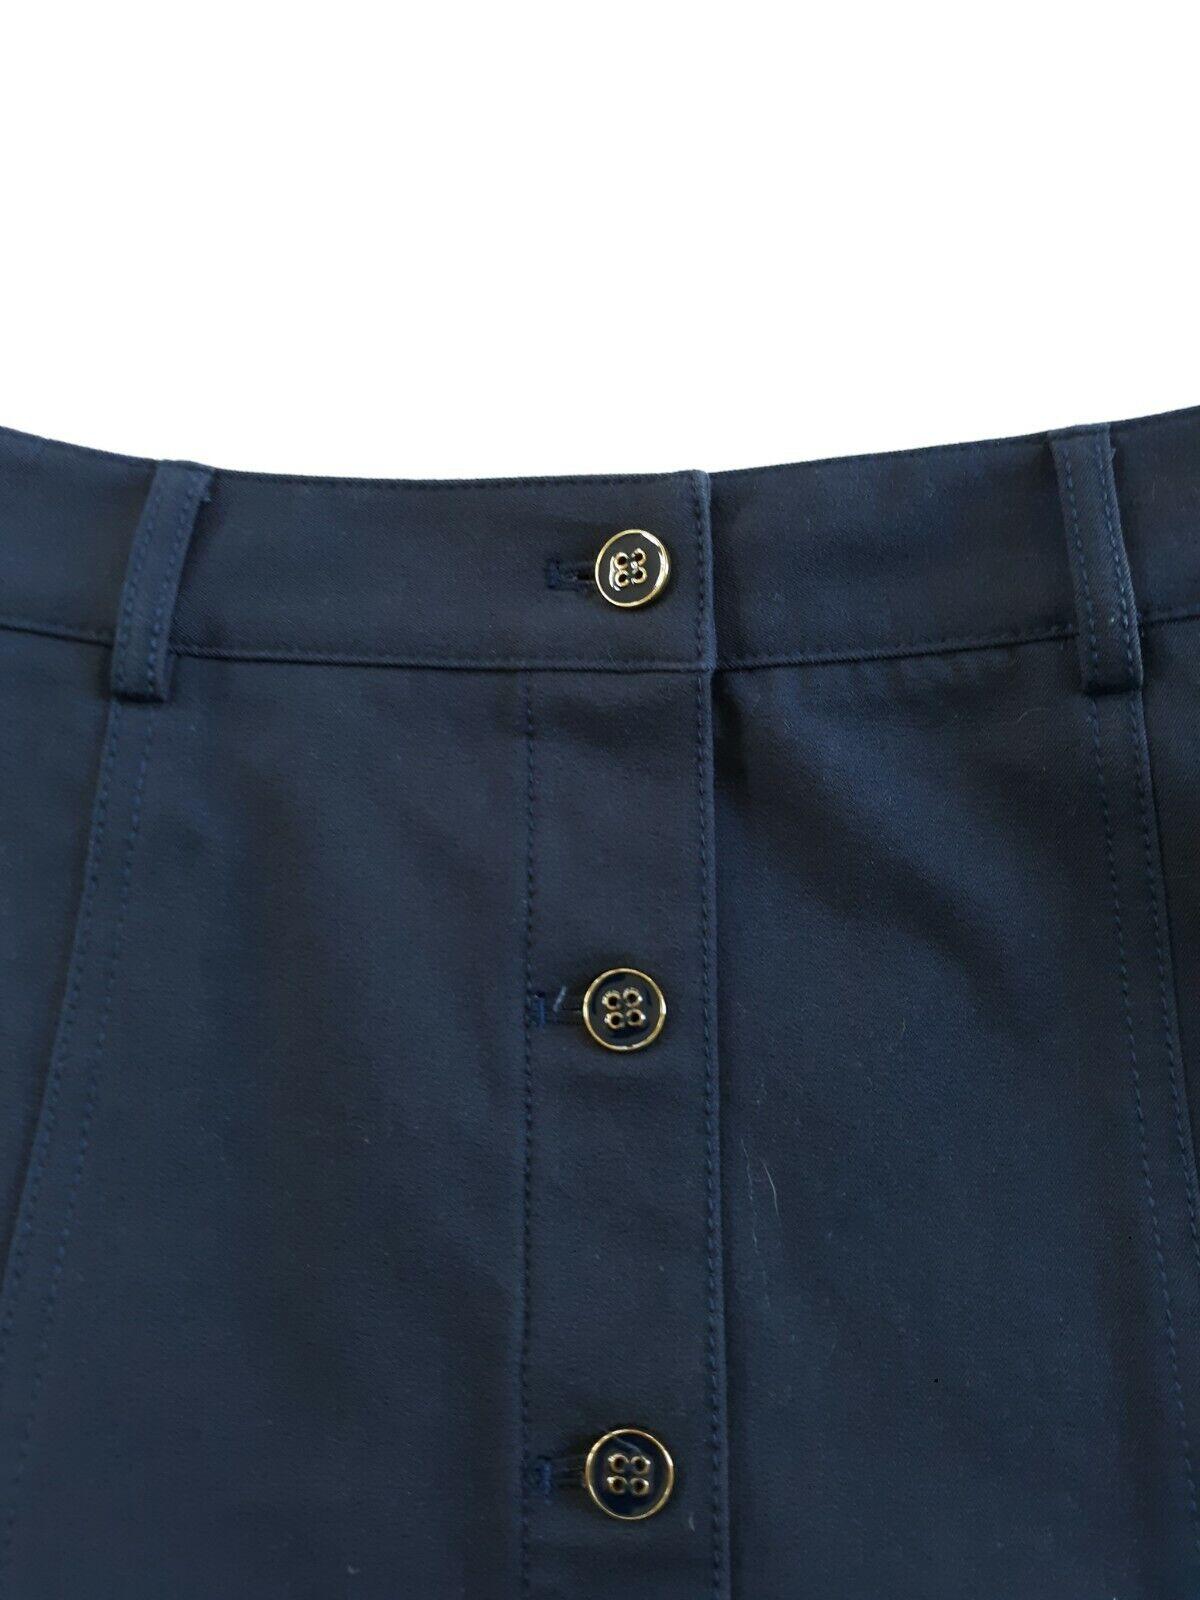 J McLaughlin Teal Button Front A Line Skirt Size 2 - image 8